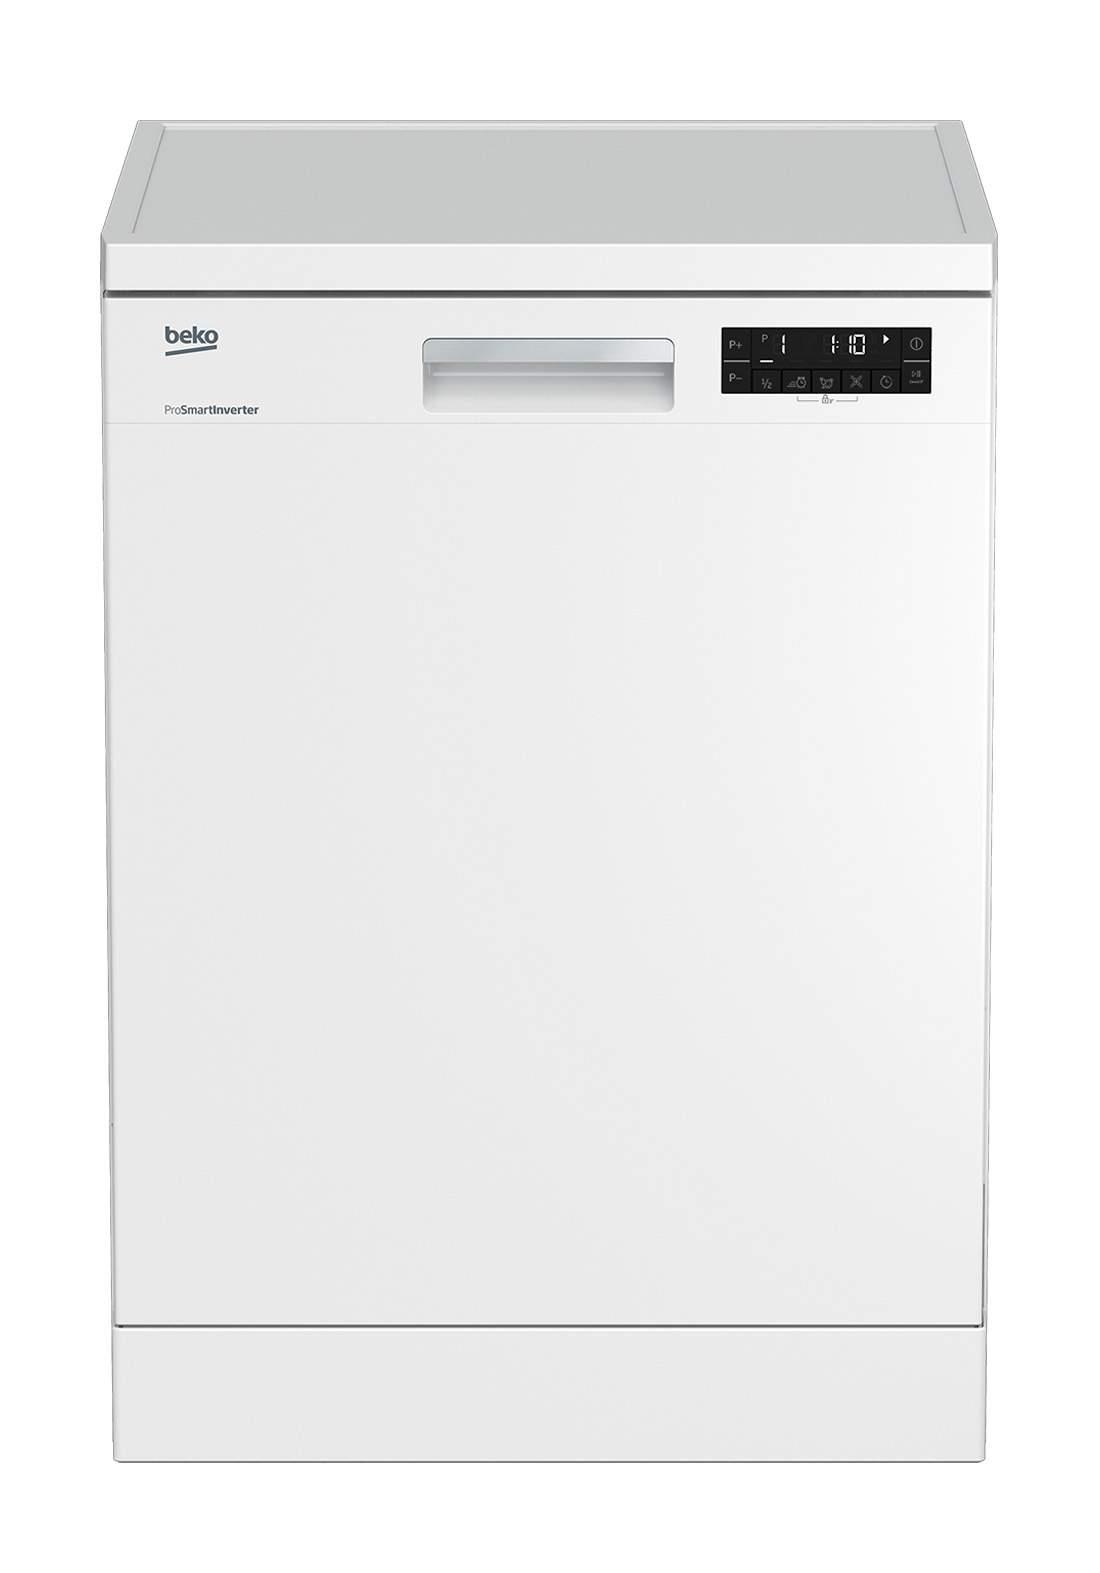 Beko DFN 28422W Dishwasher 8 Programs Capacity Of 14 Sets - White  غسالة صحون